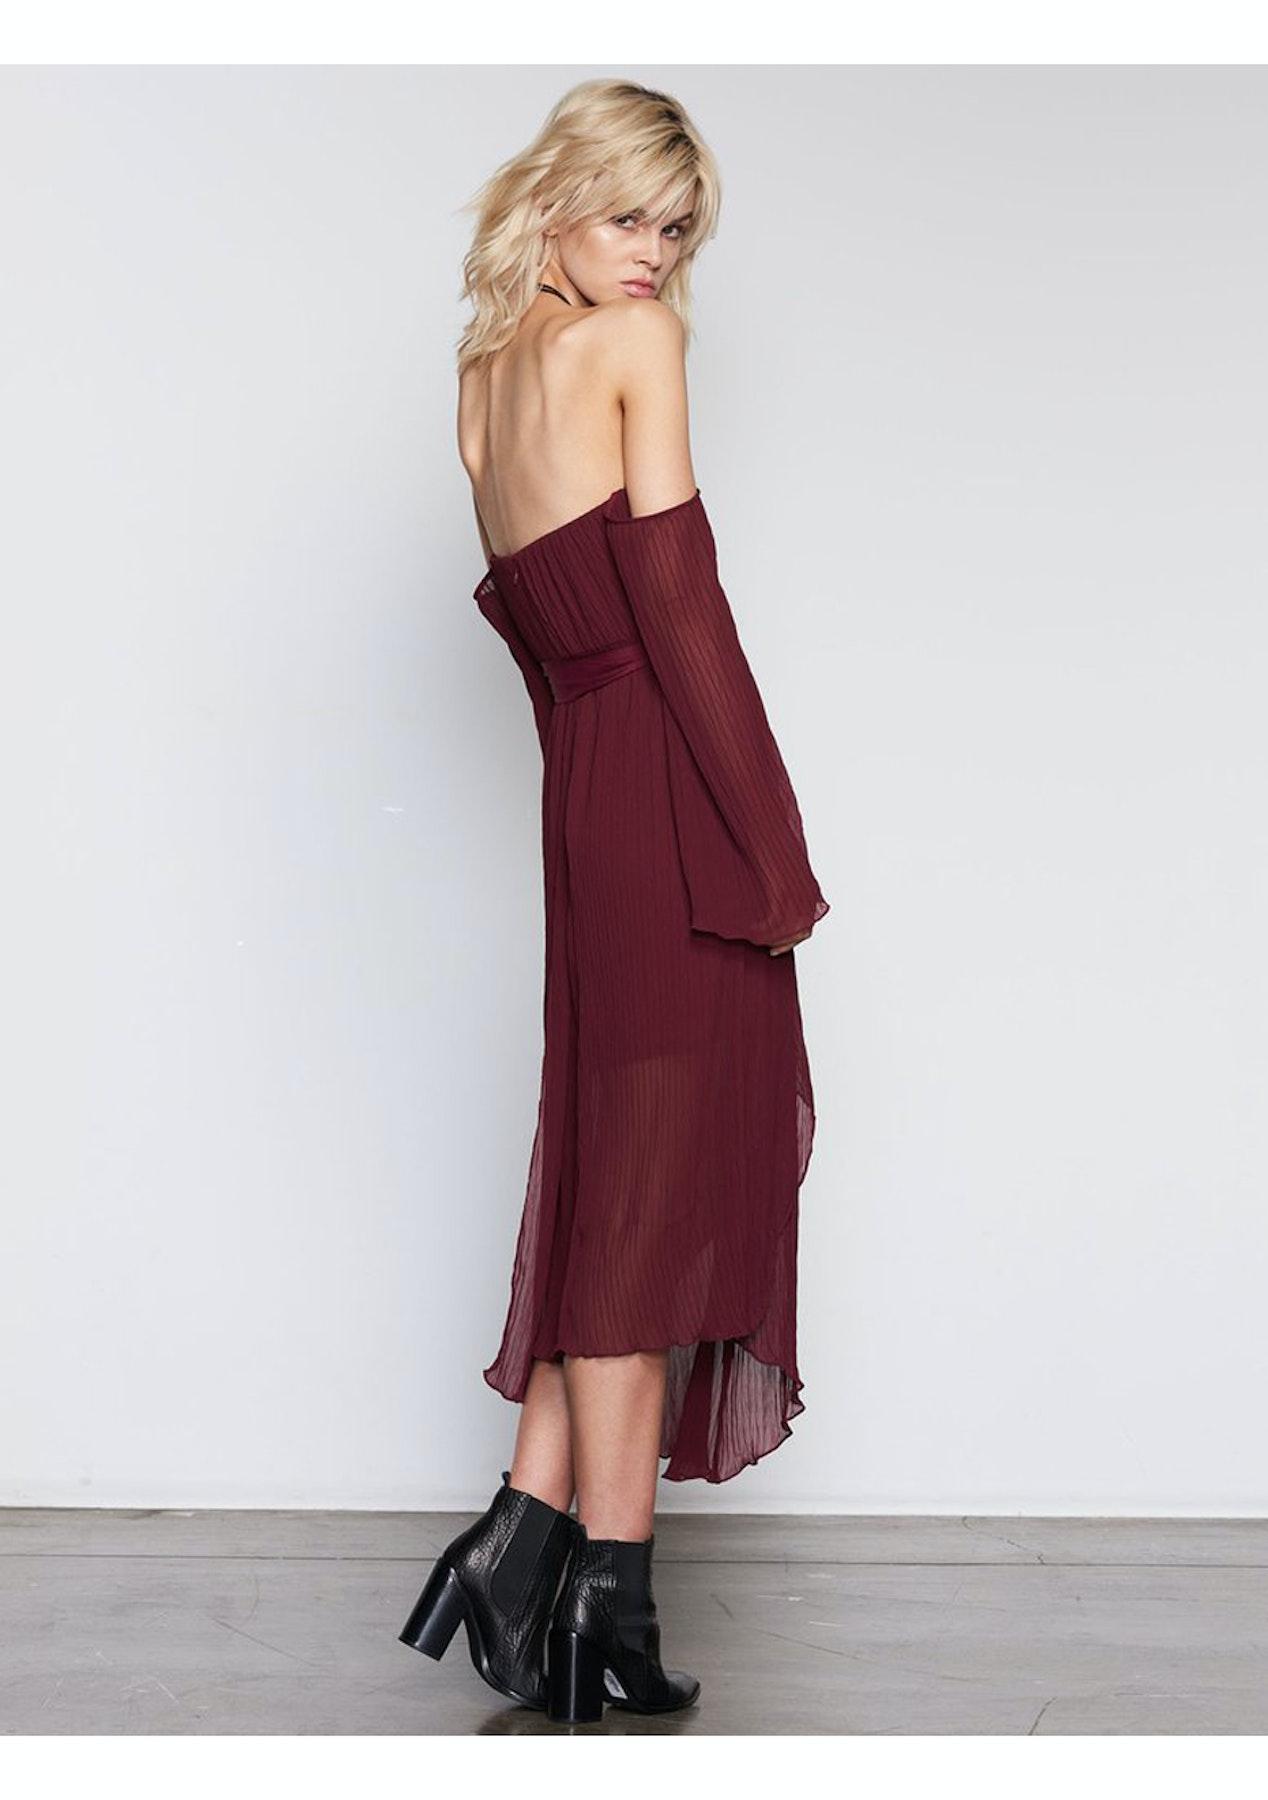 3515bdfd2e35 ISLA - Ethereal Midi Dress - Burgundy - Designer Garage Sale - Onceit